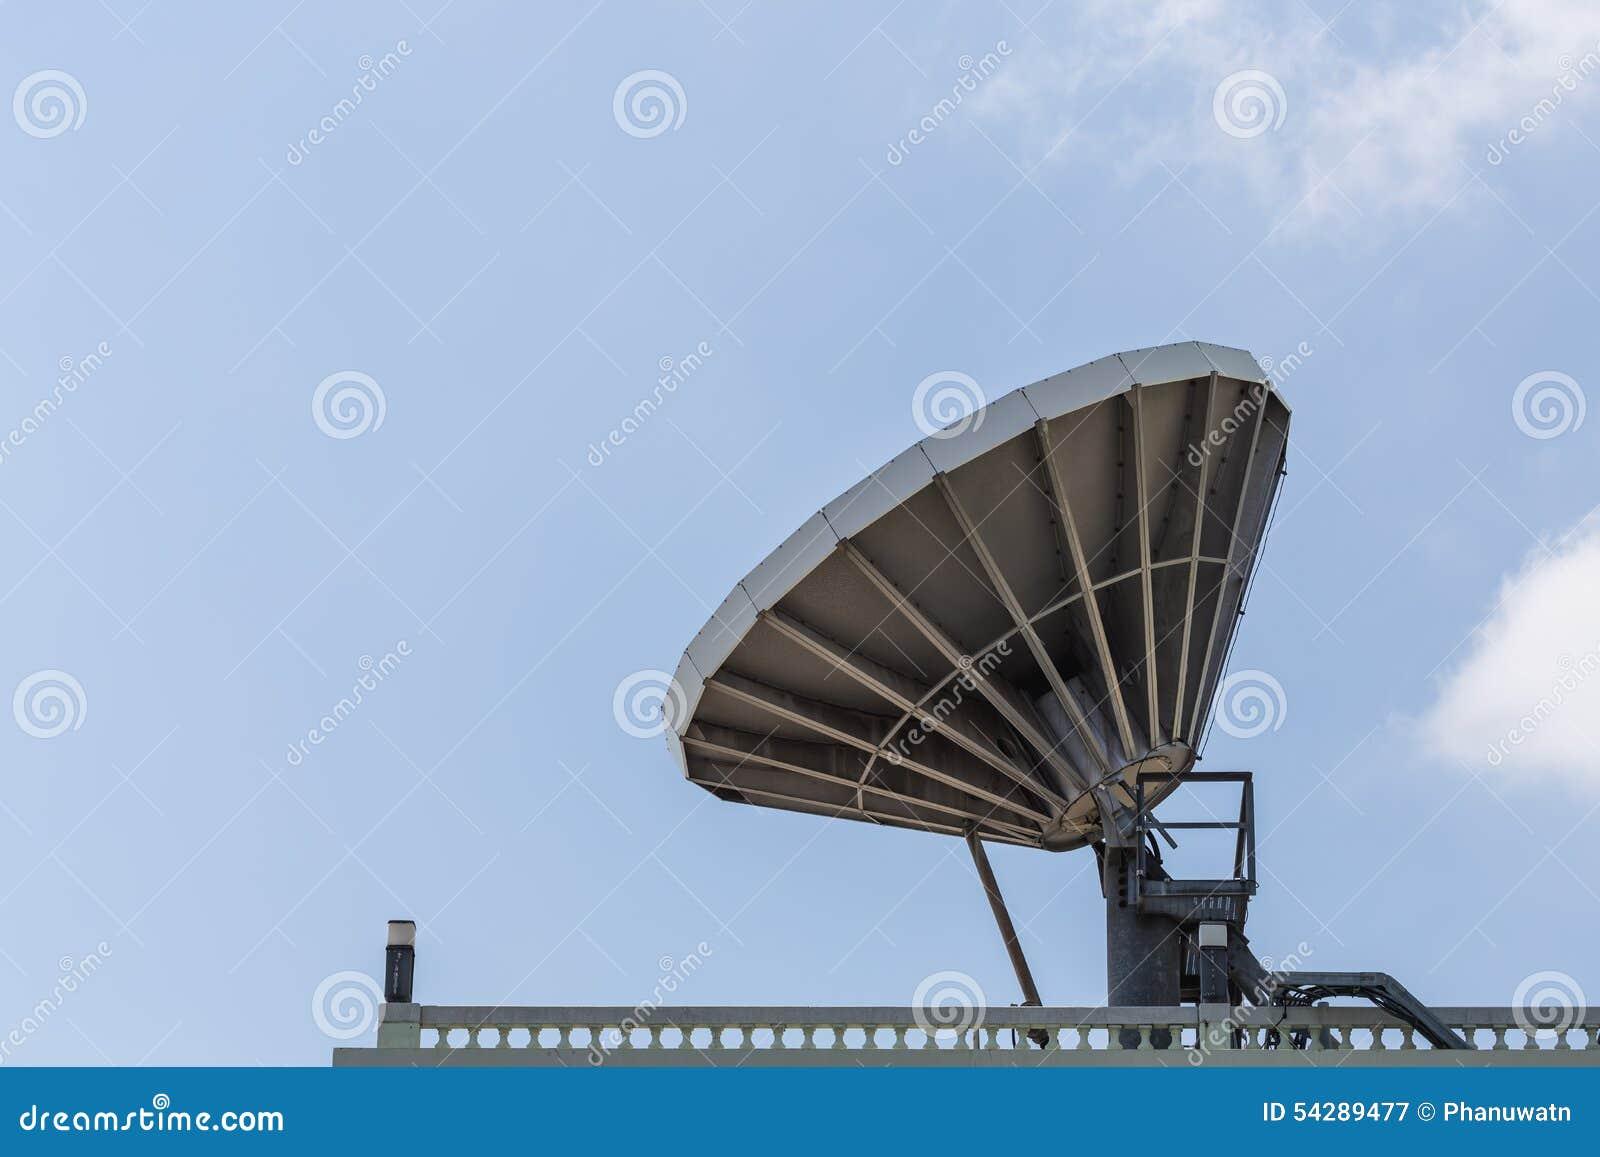 Большая спутниковая антенна-тарелка на крыше